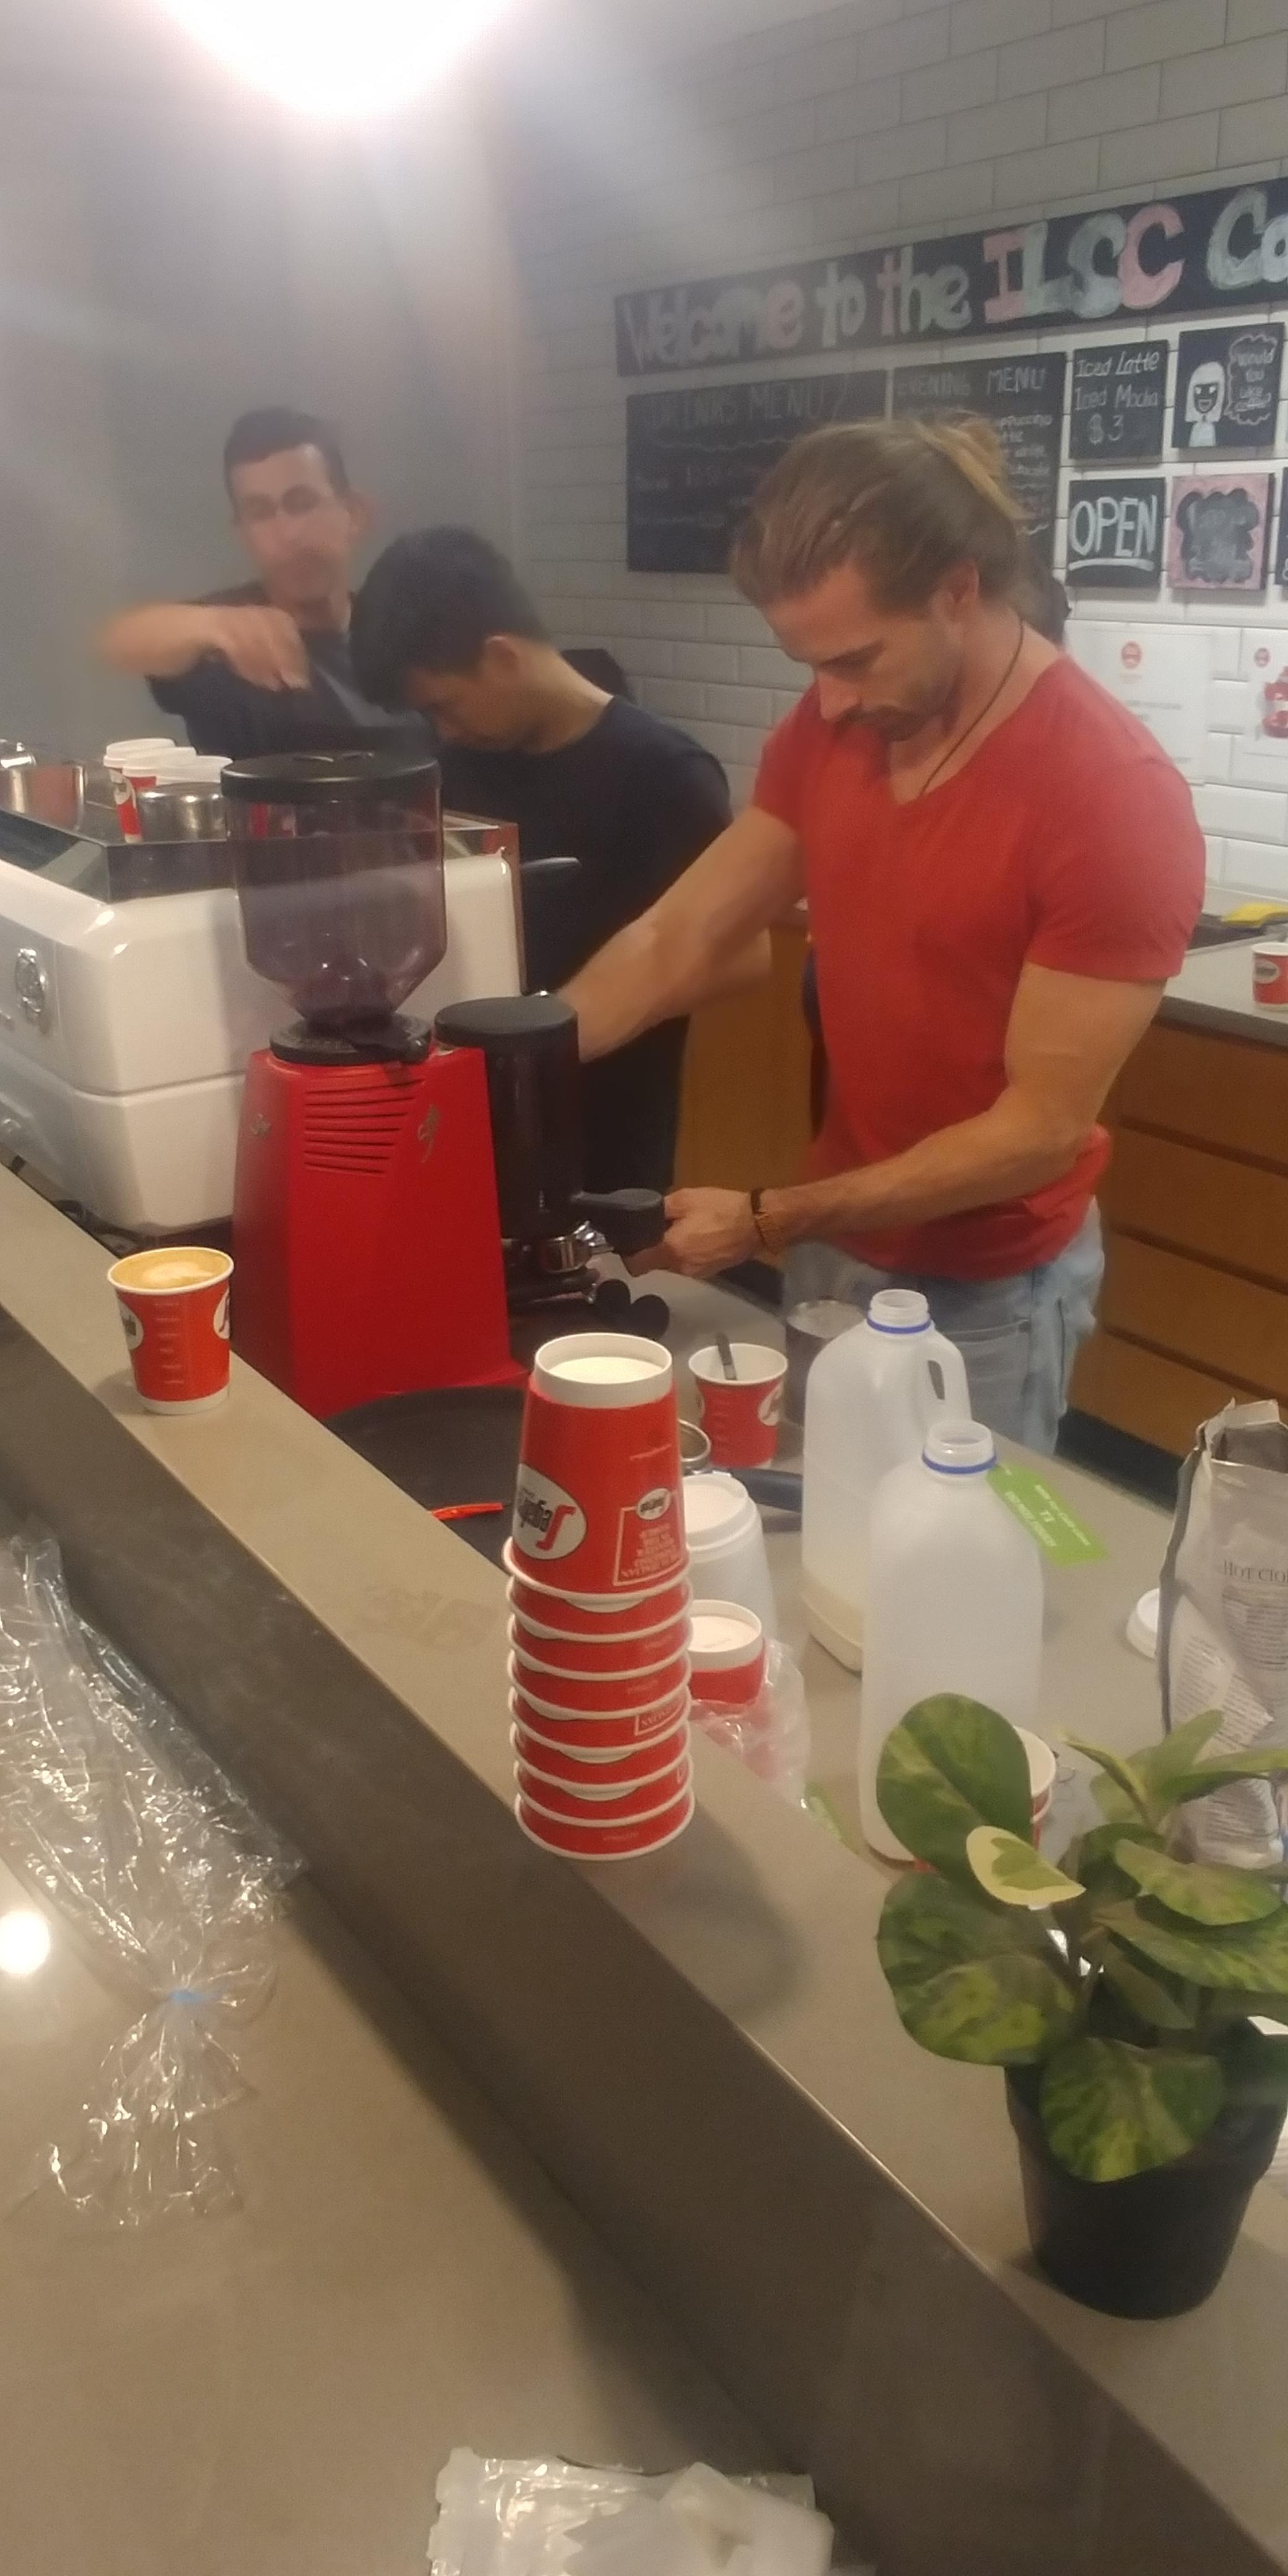 [ILSC-½Ãµå´Ï]3Æí: coffee baristar class°¡ ³Ê¹« Àç¹ÌÀÖ¾î¿ä!!